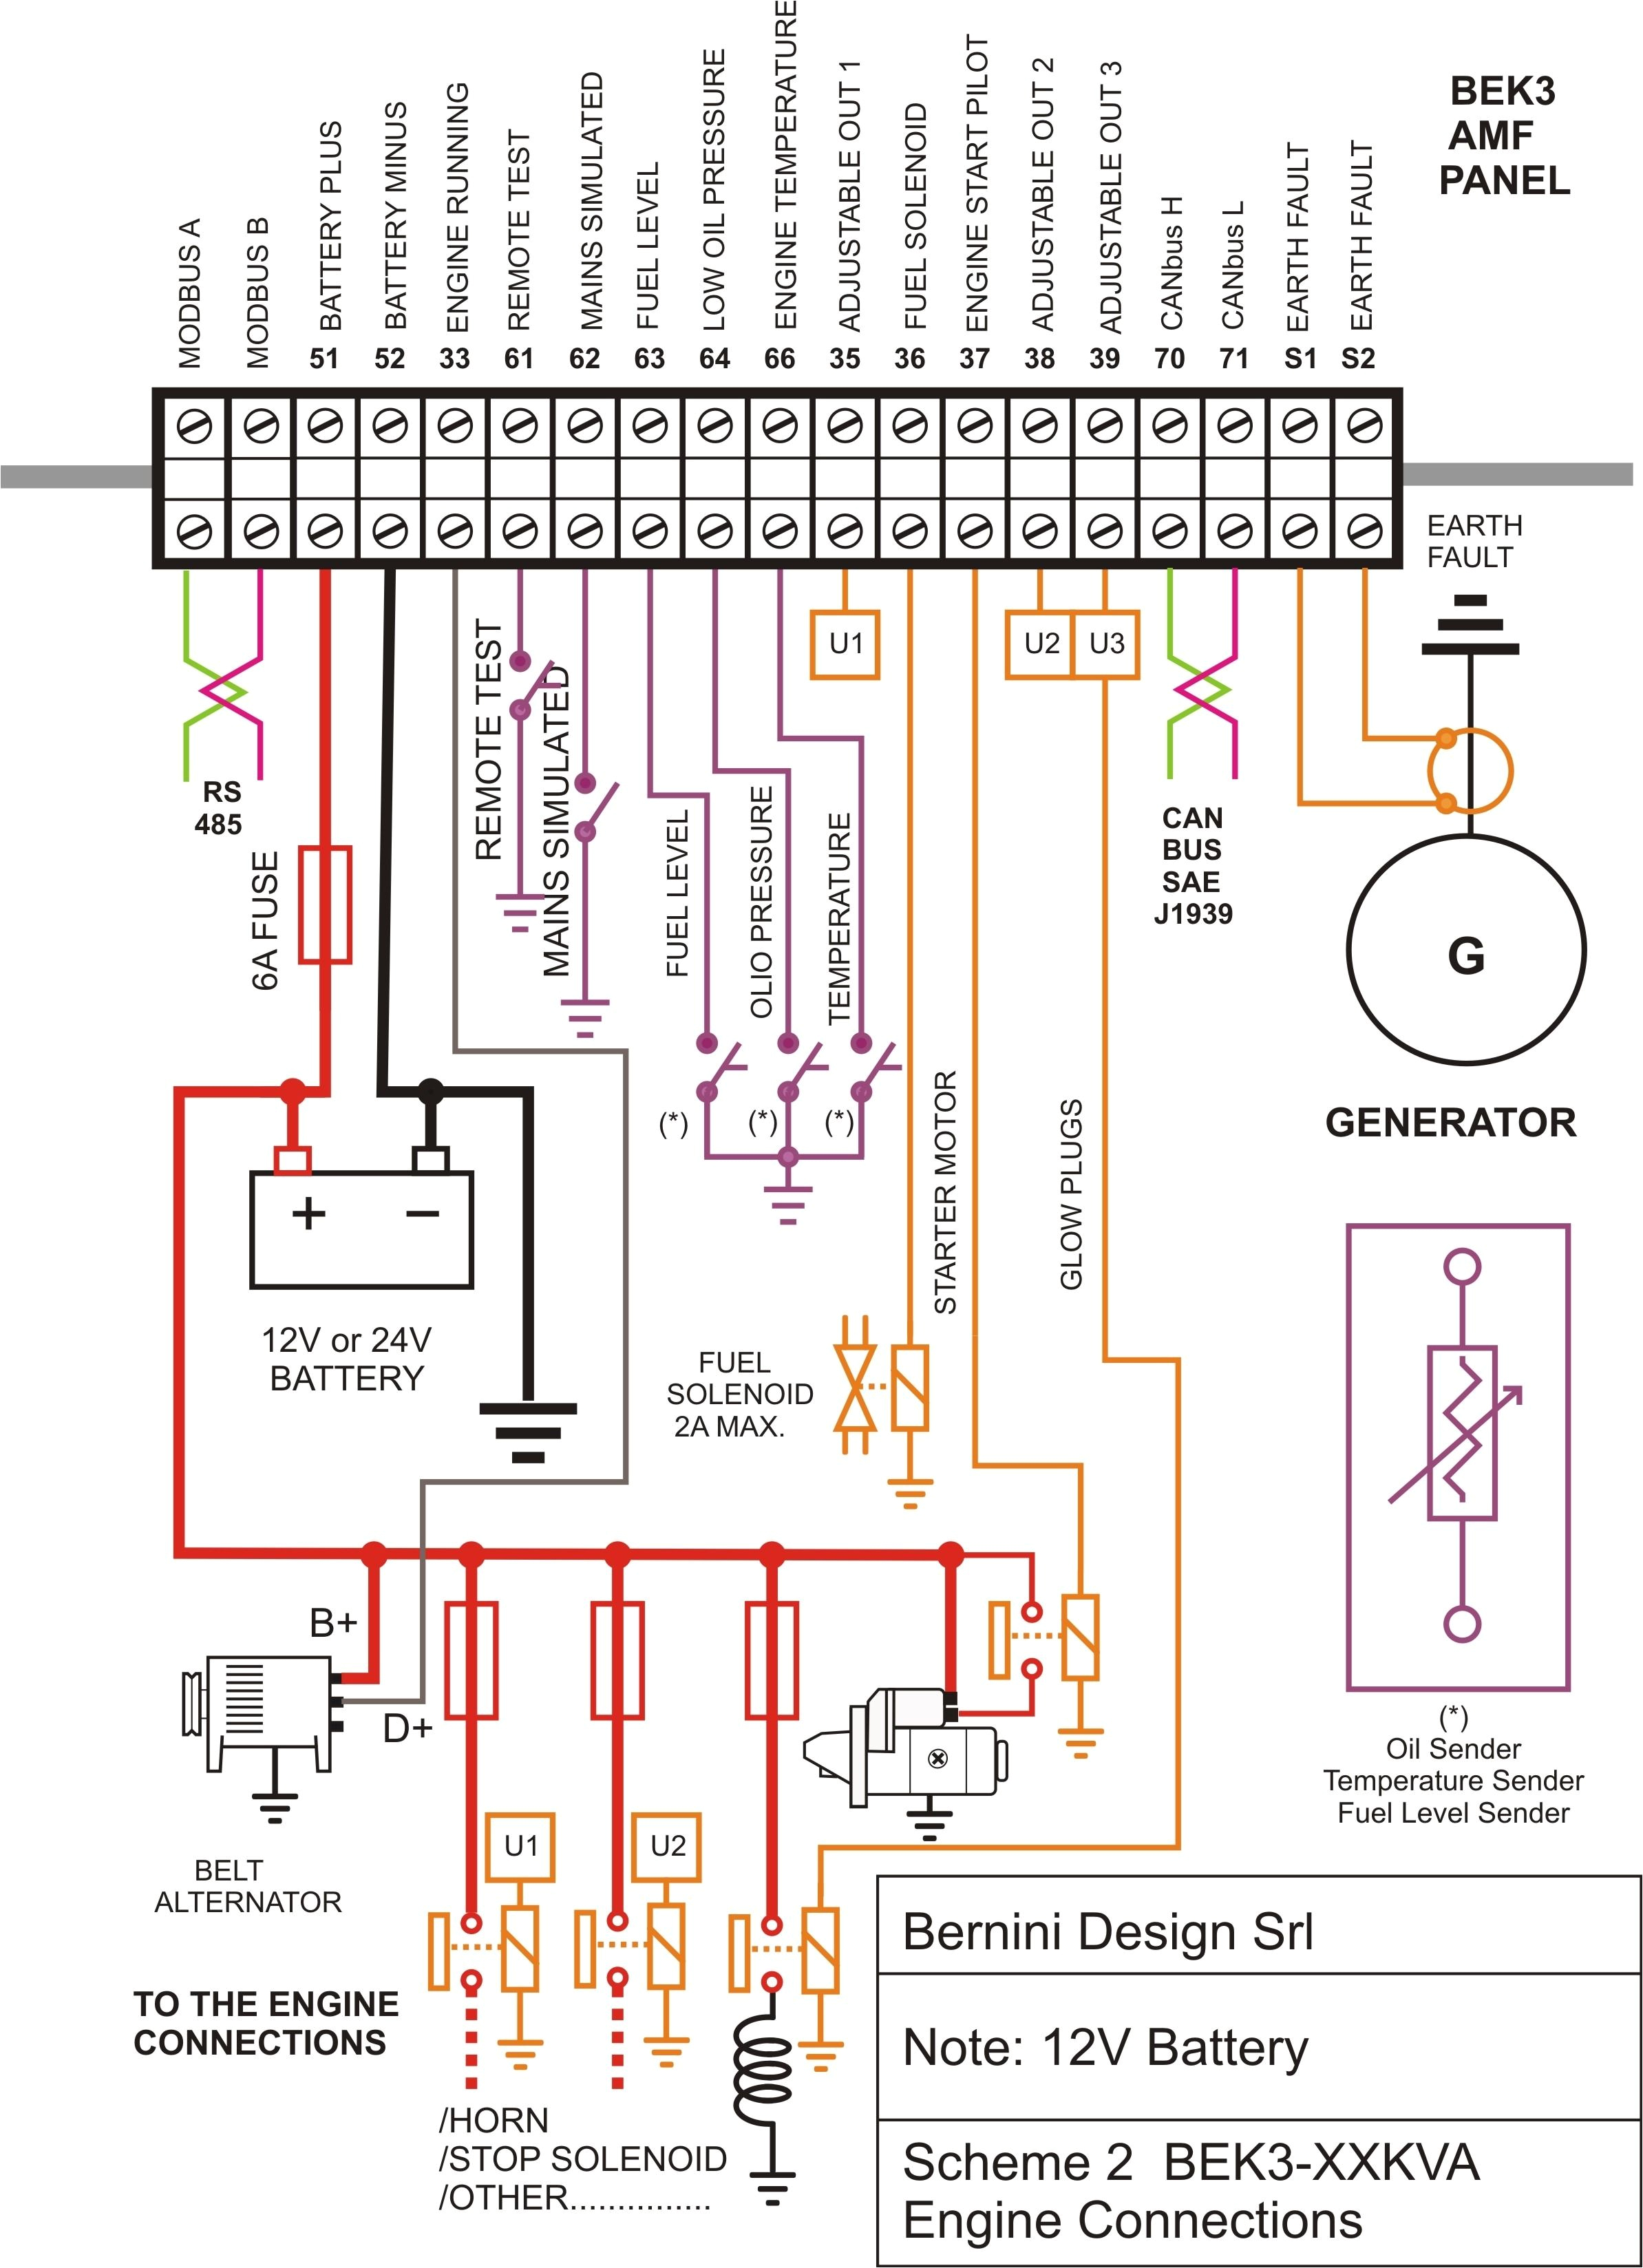 control wiring basics pdf wiring diagram for you star delta control wiring diagram pdf basic electrical